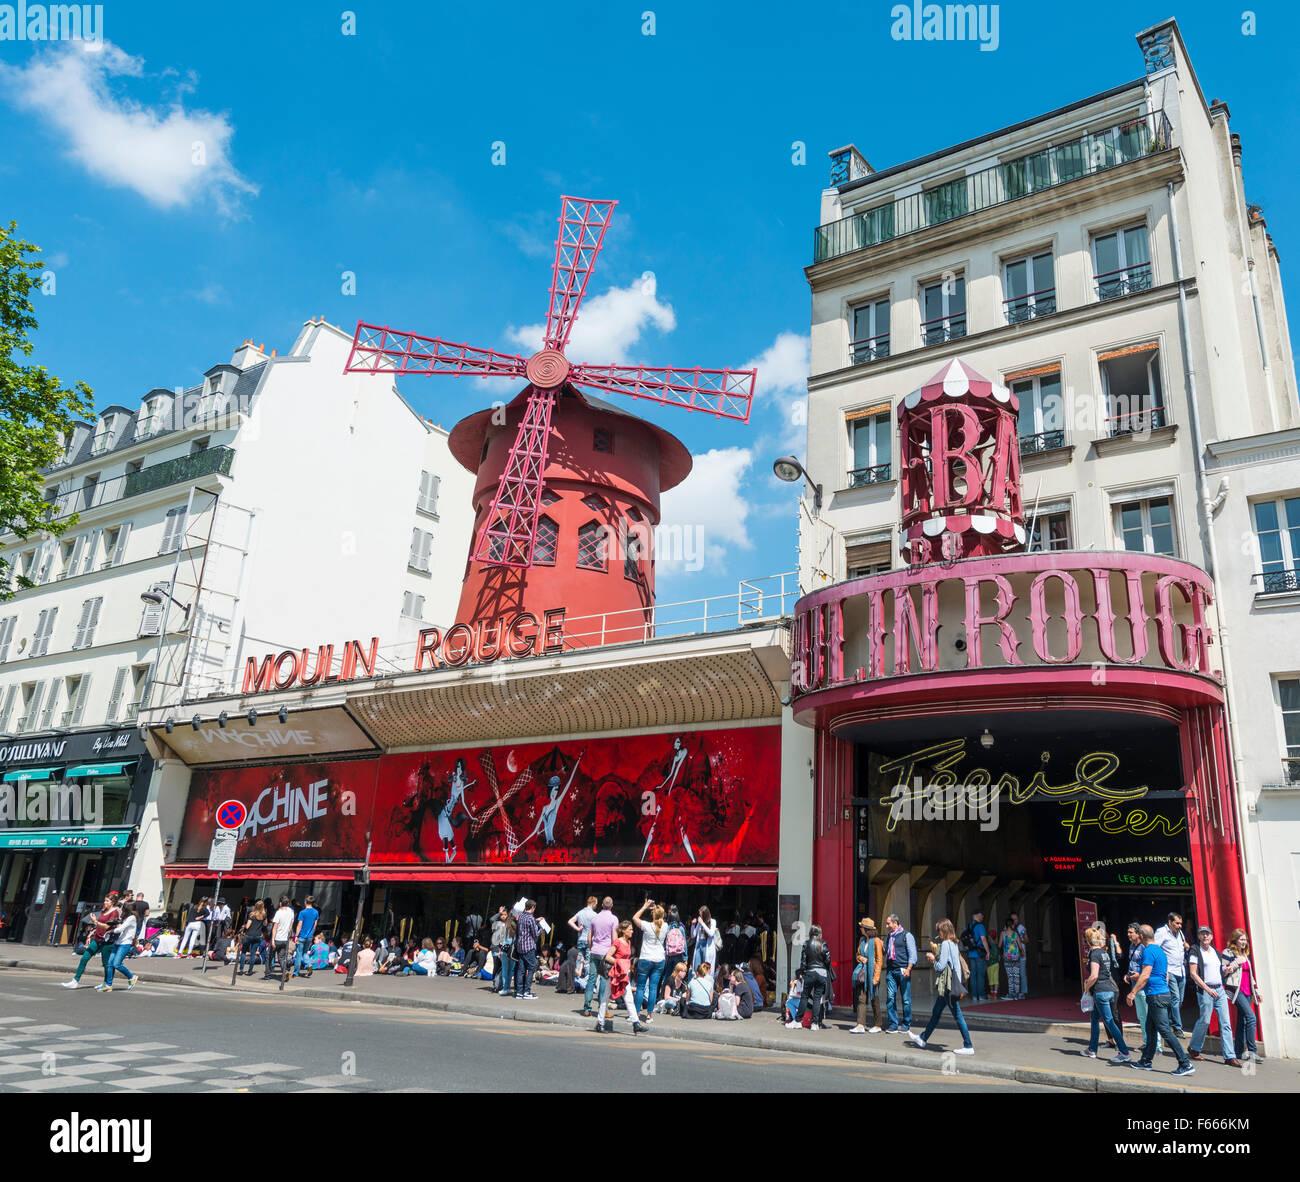 Moulin Rouge, da Montmartre, Parigi, Ile-de-France, Francia Immagini Stock